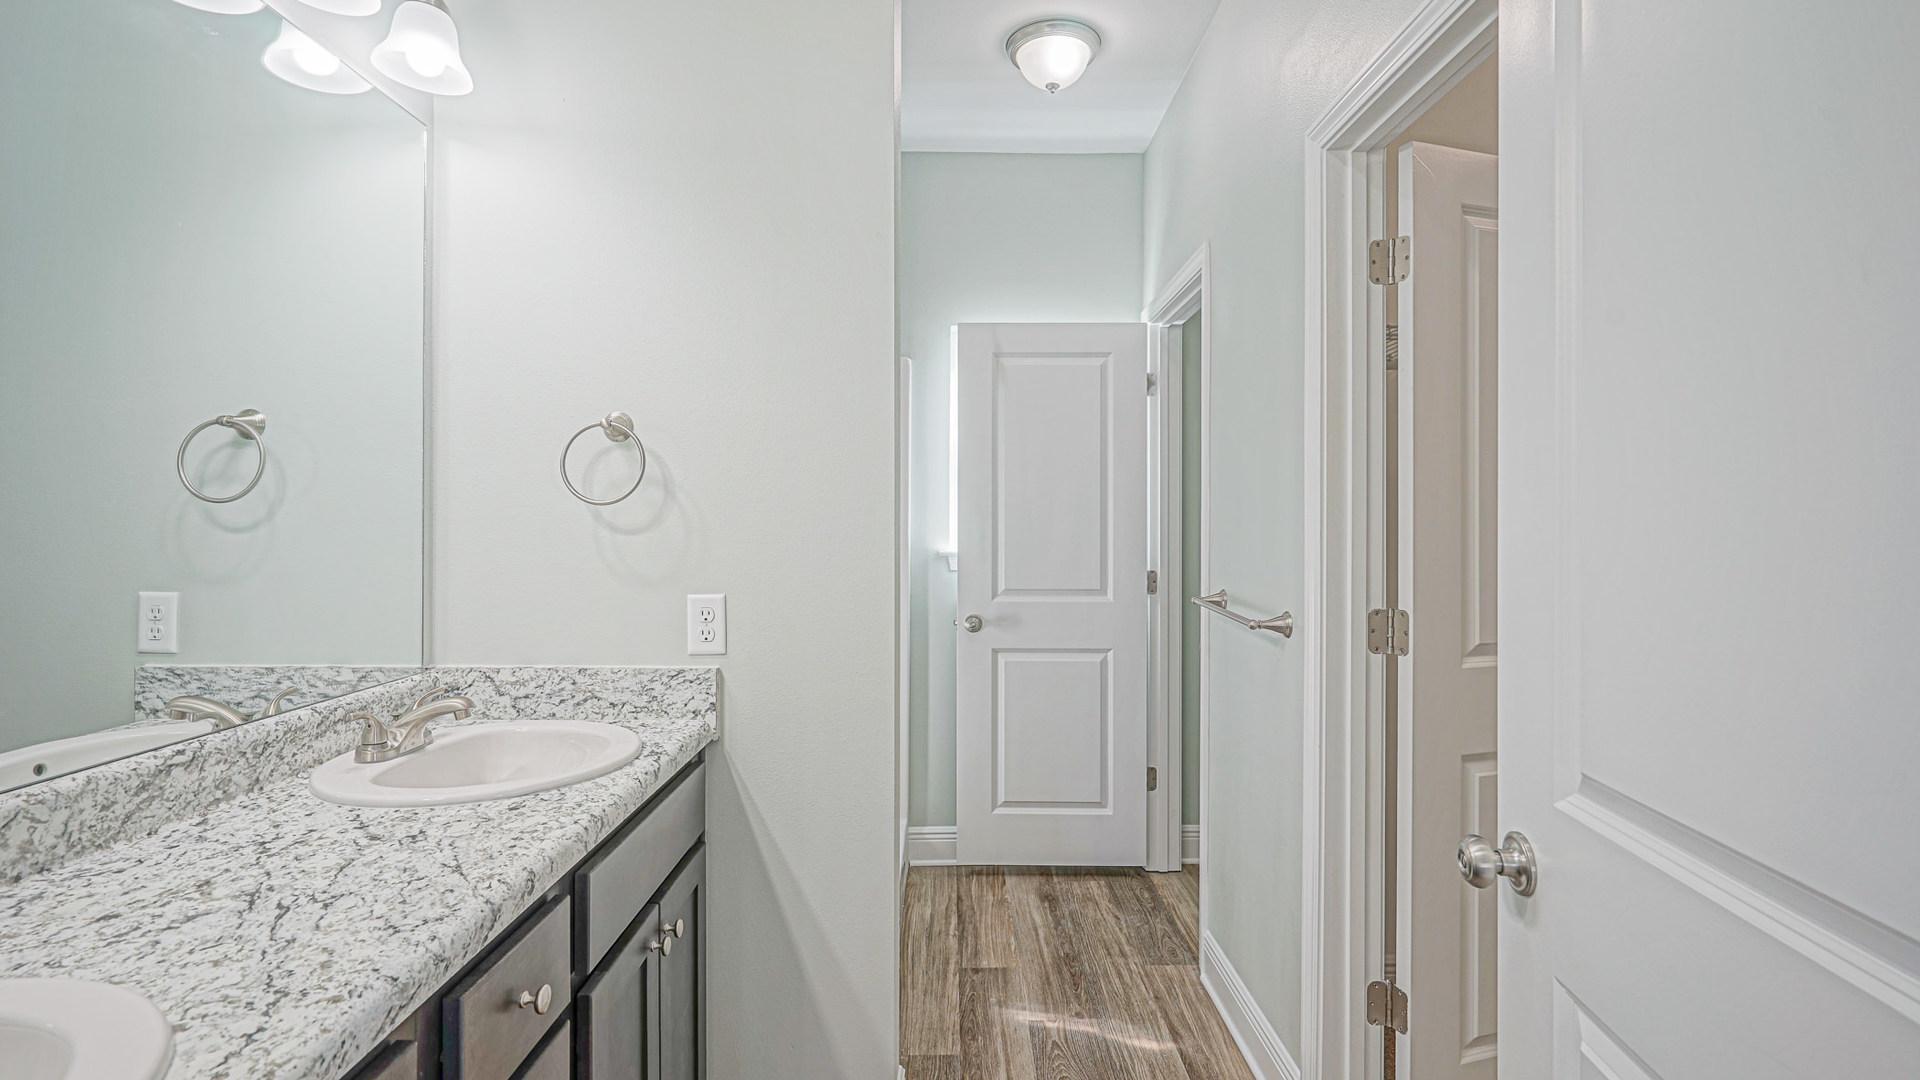 196 Johnson Ct Shiloh Place Bathroom